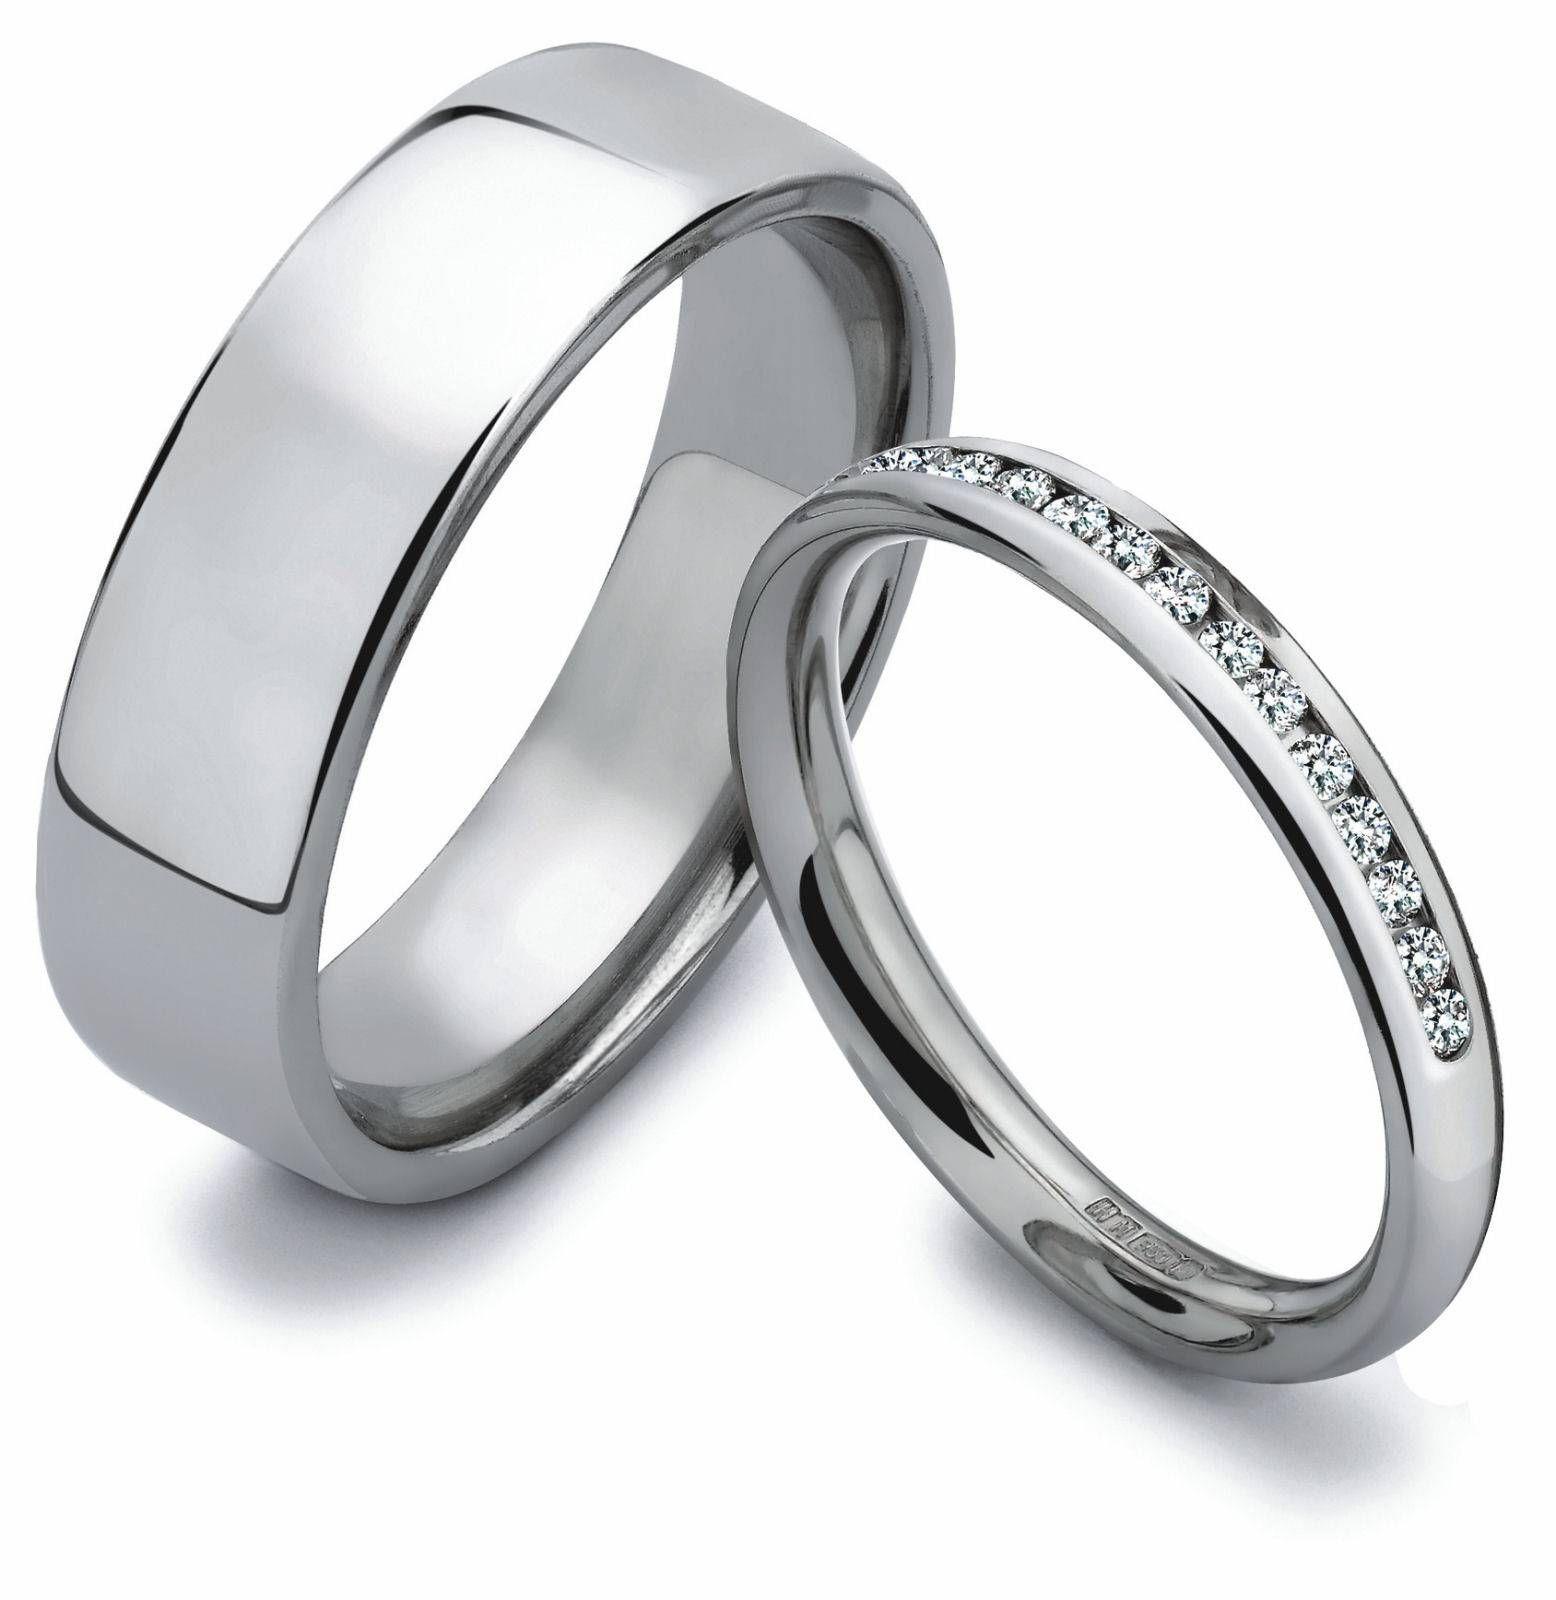 mens platinum wedding bands near me